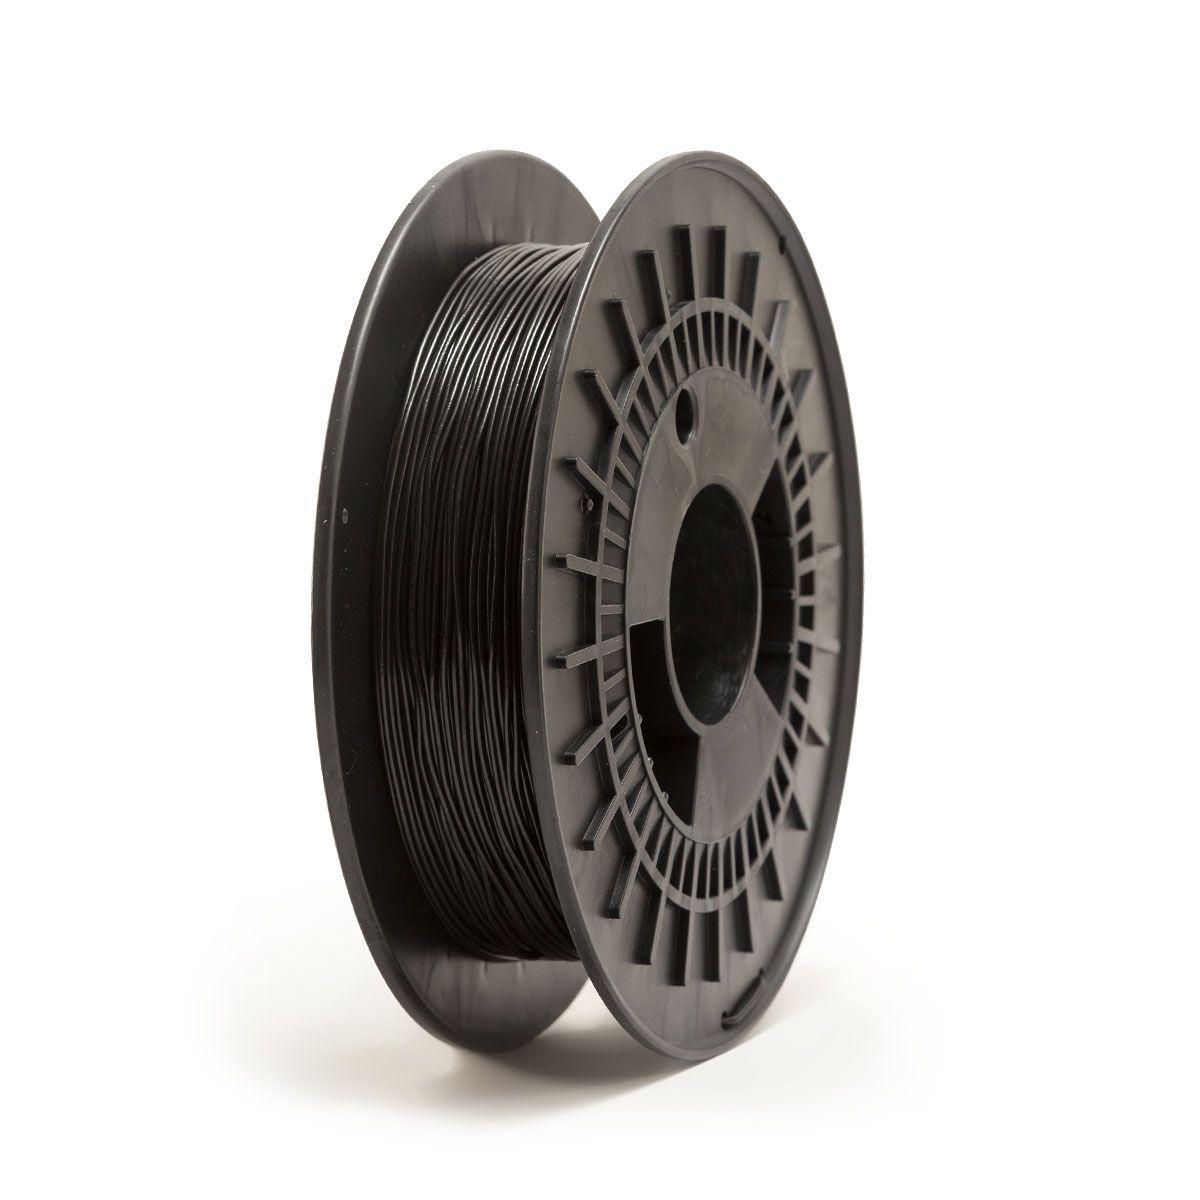 PA Filament | Color: Nylon Carbon Fiber